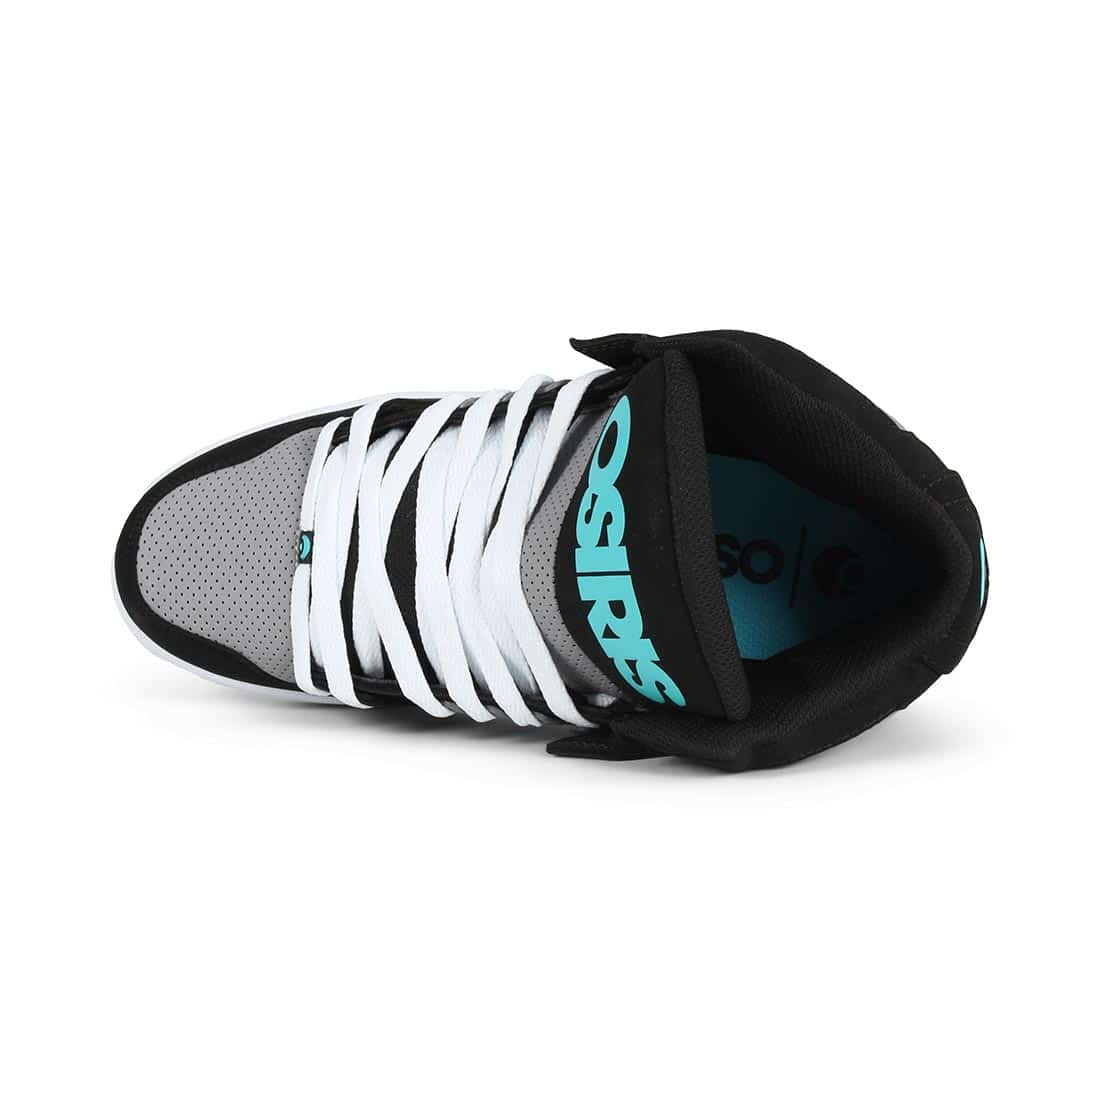 Osiris NYC 83 CLK High Top Shoes - Black / Grey / Cyan